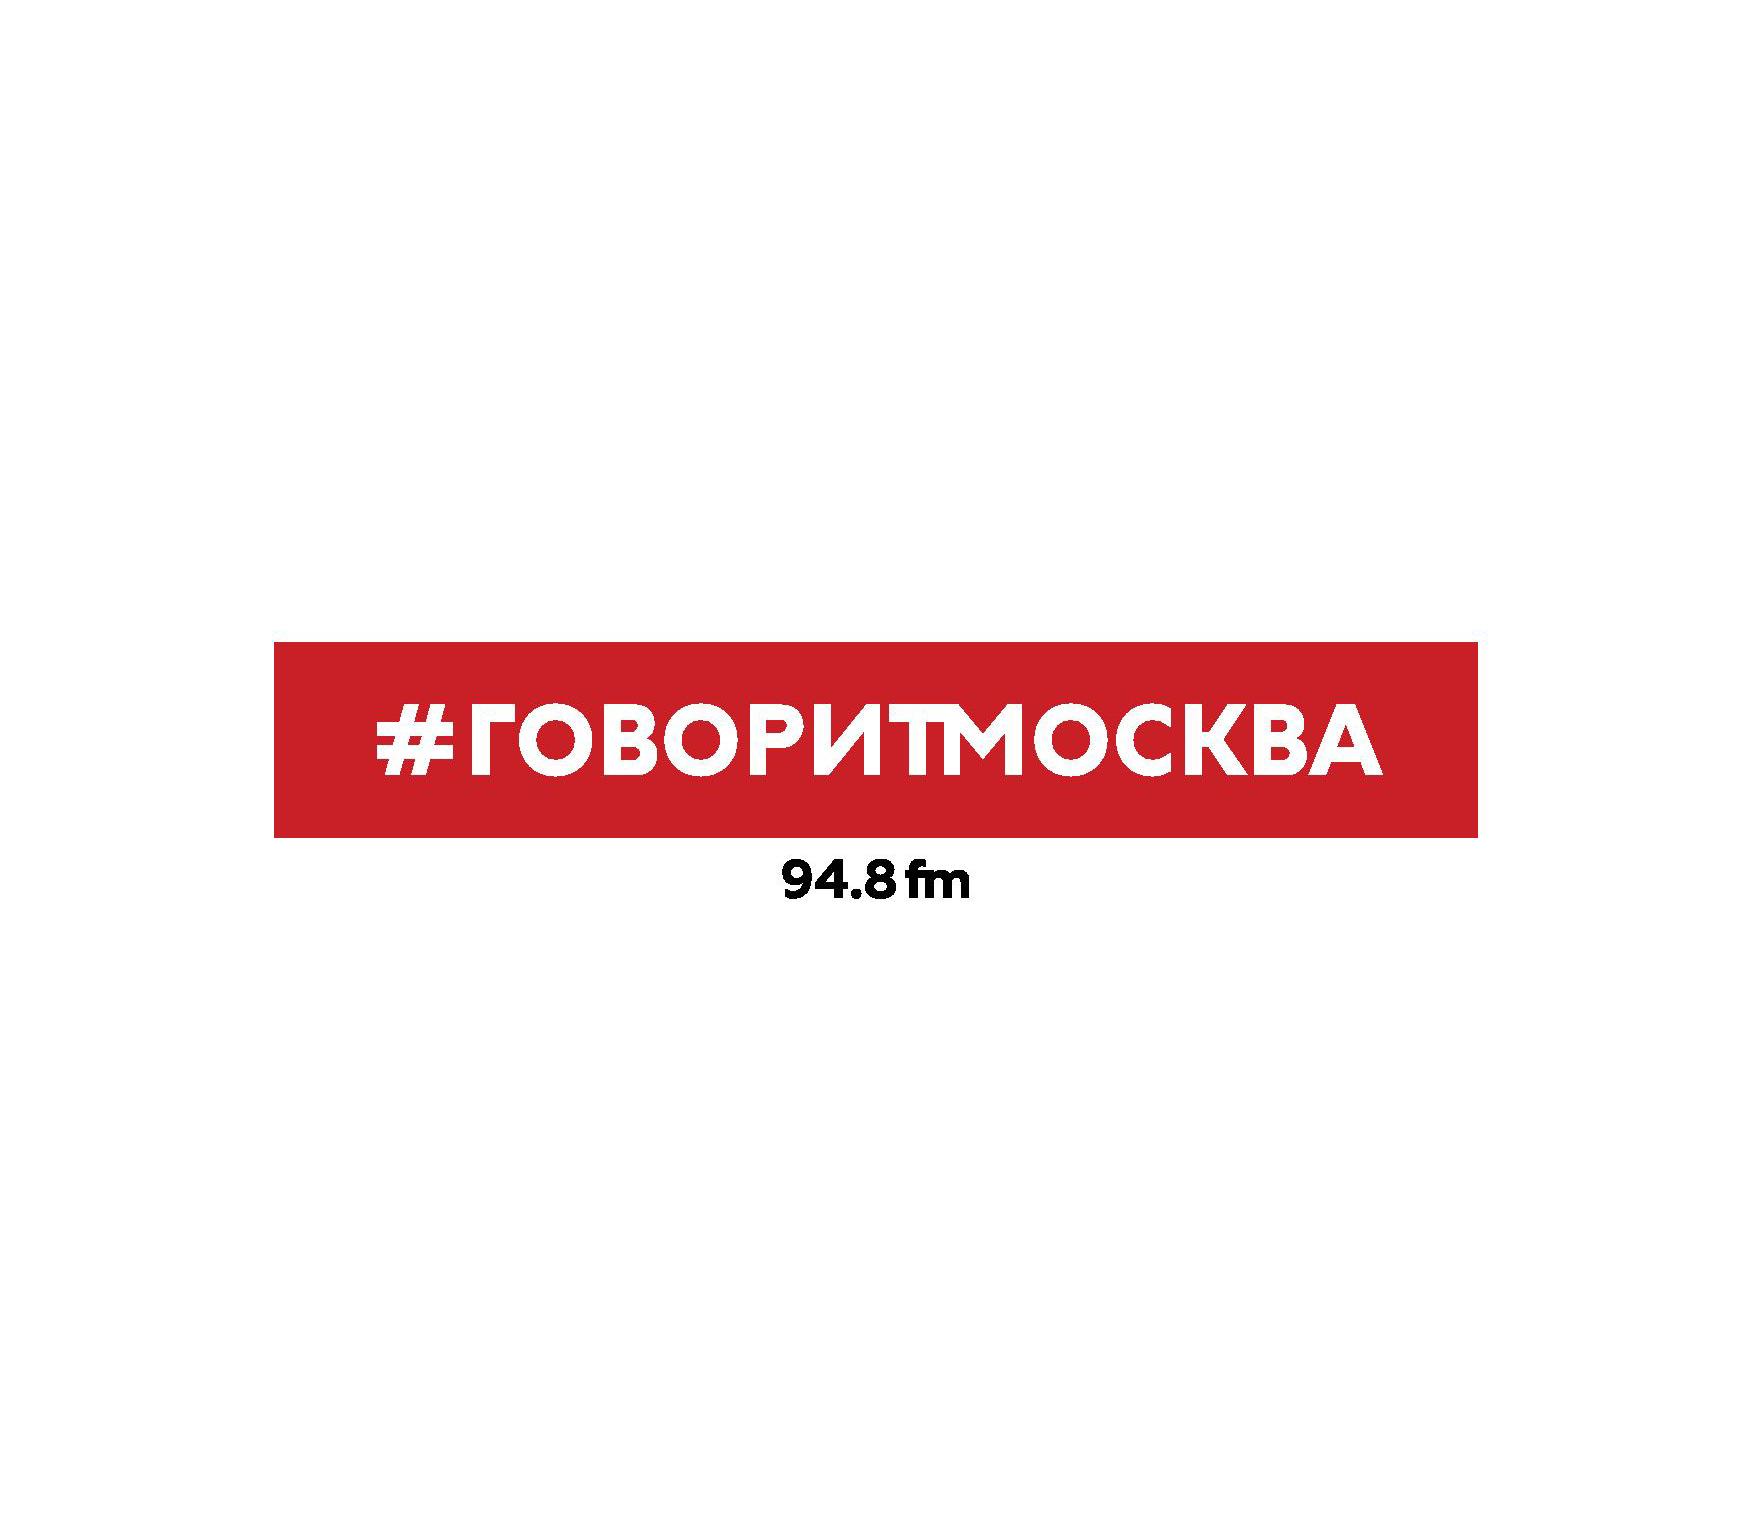 Макс Челноков 18 апреля. Максим Сураев